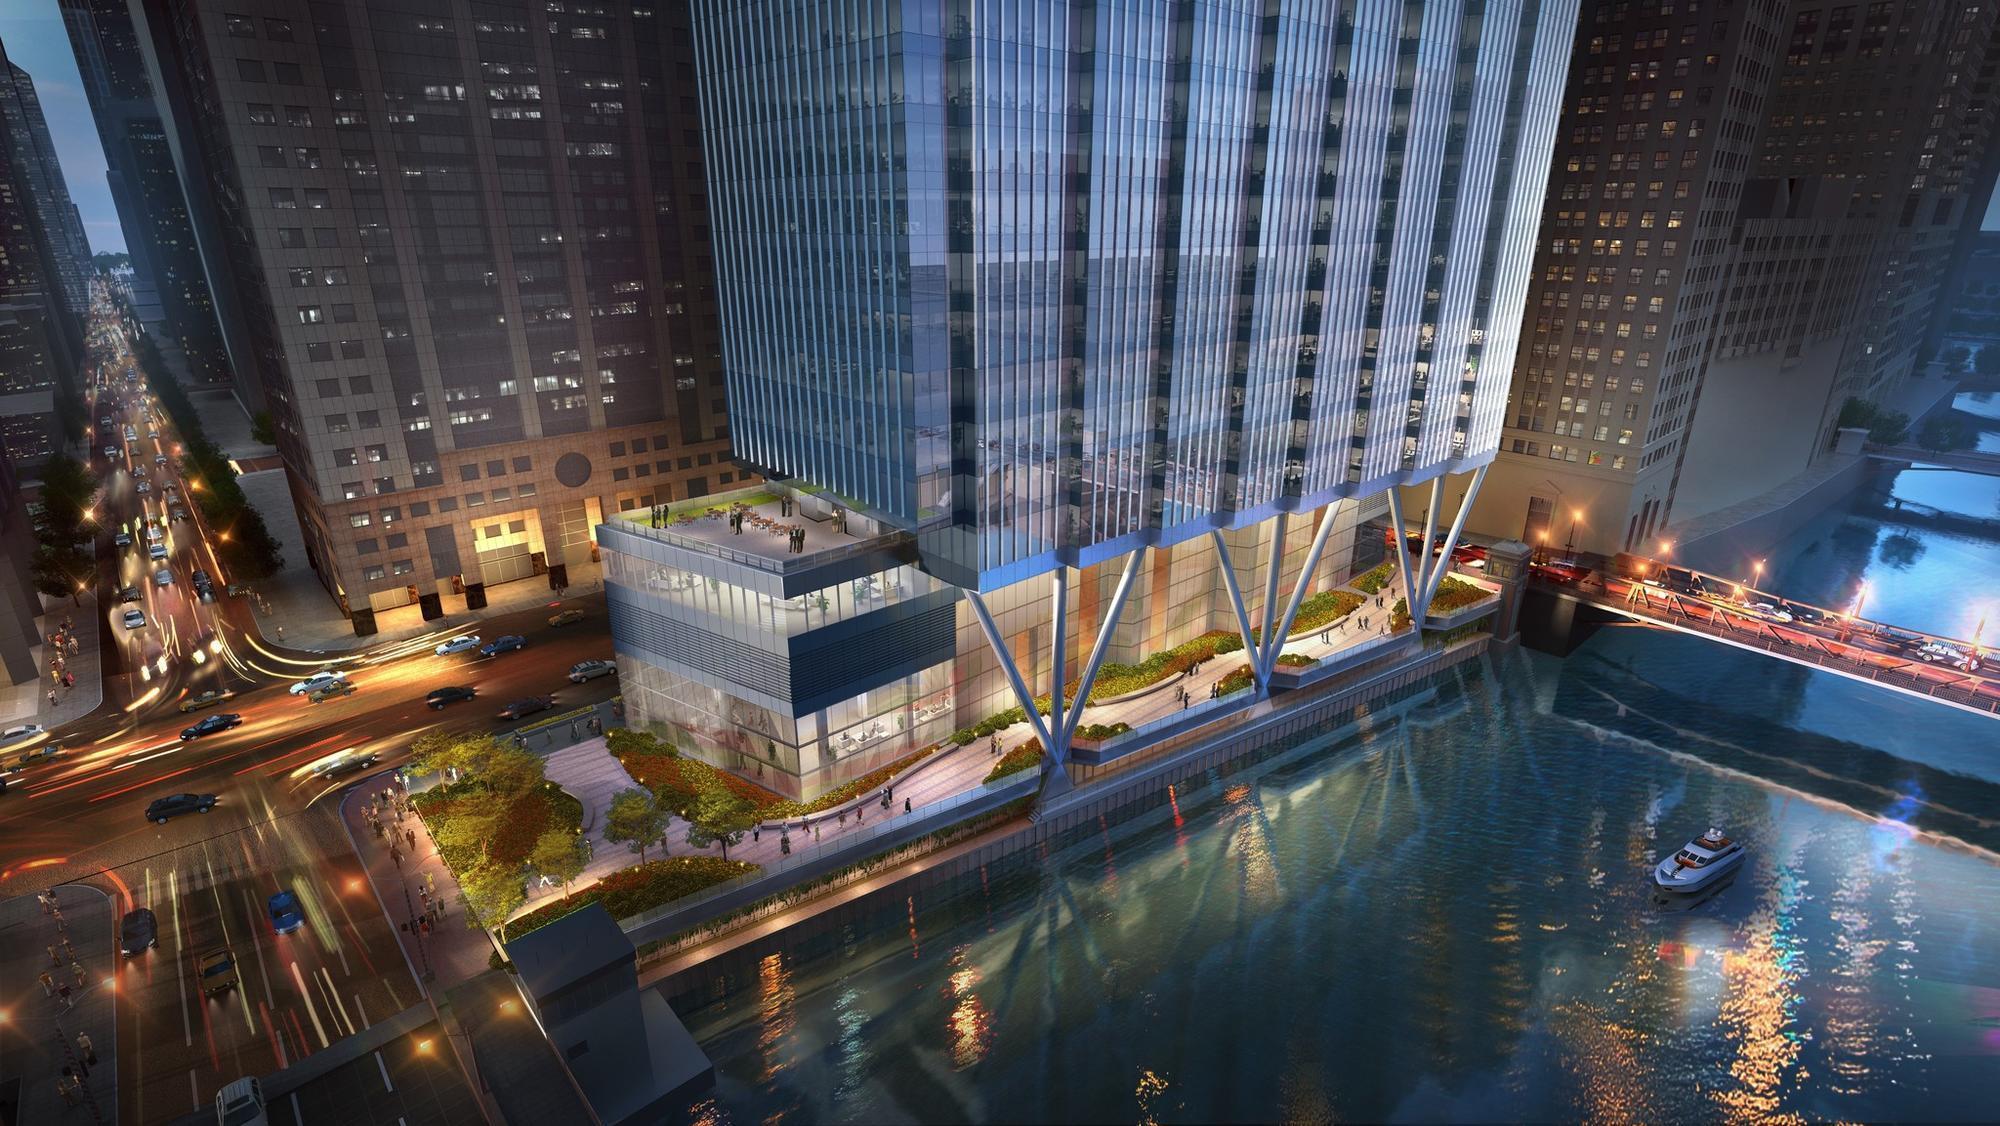 Wacker Drive Office Development Along Chicago River Lands 665 Million In Construction Financing